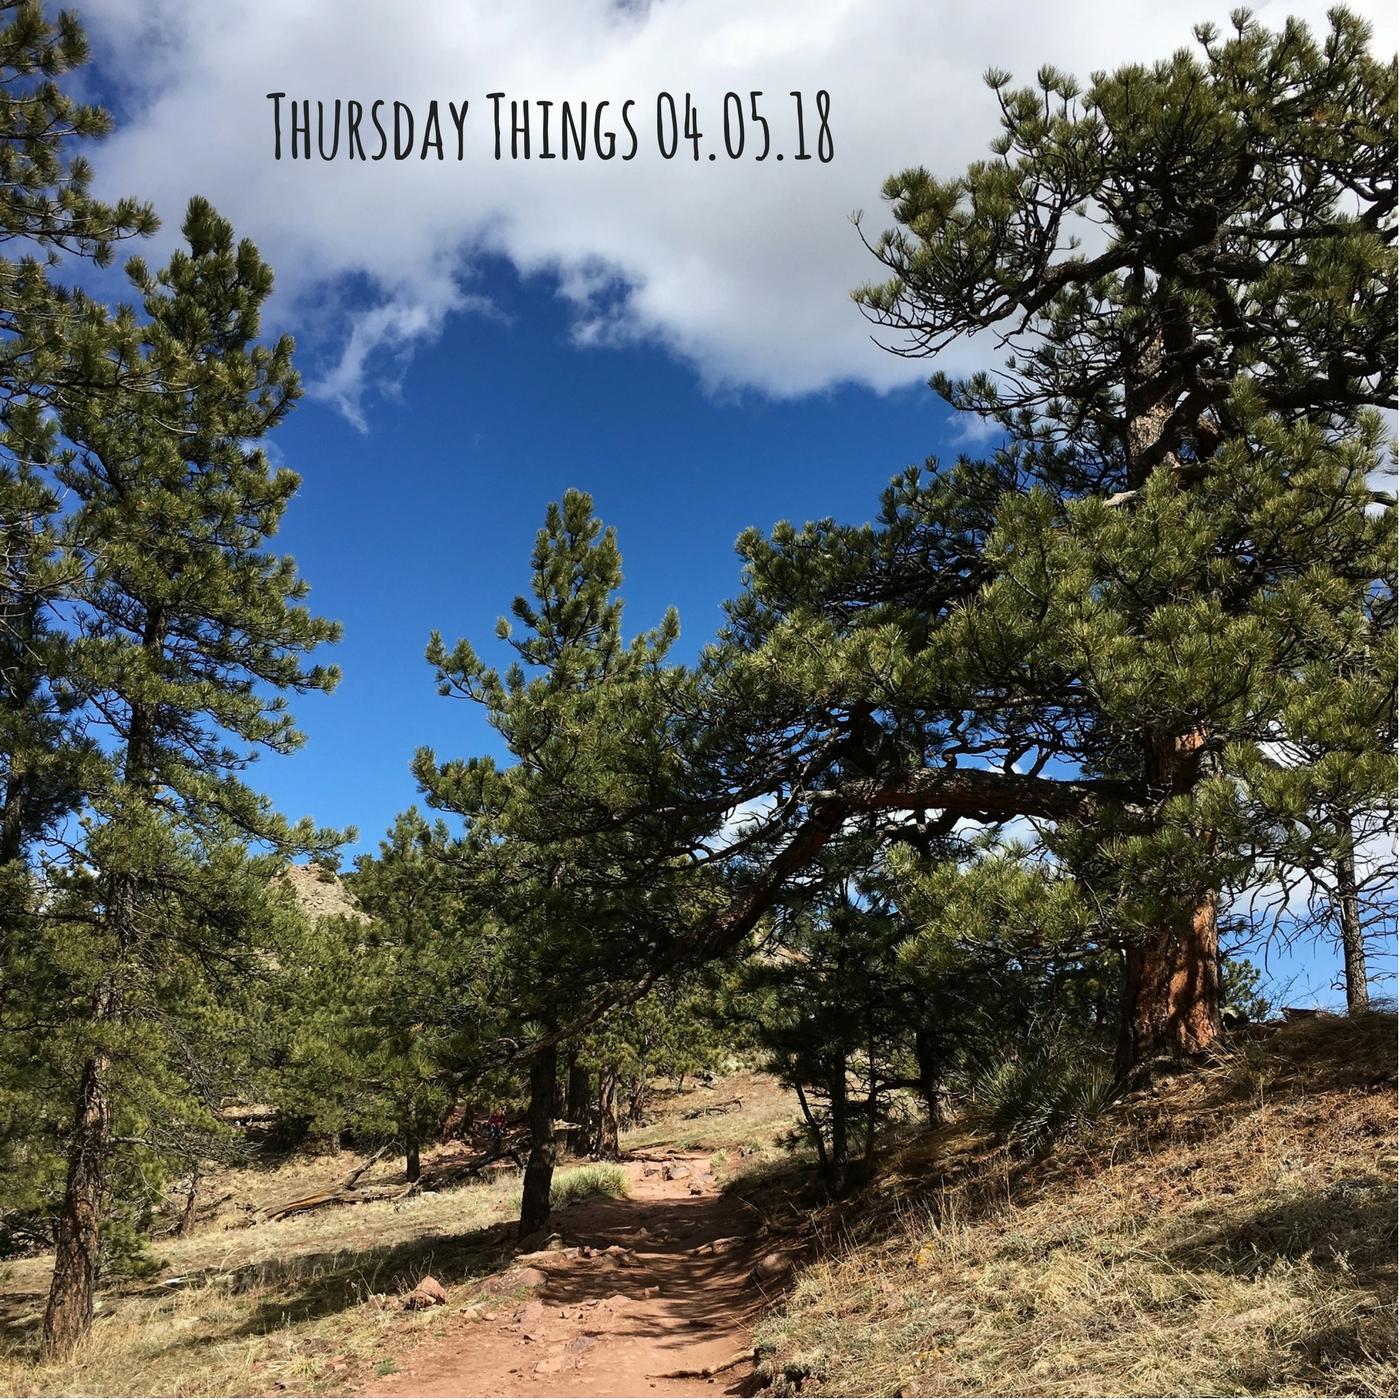 Thursday Things 04.05.18